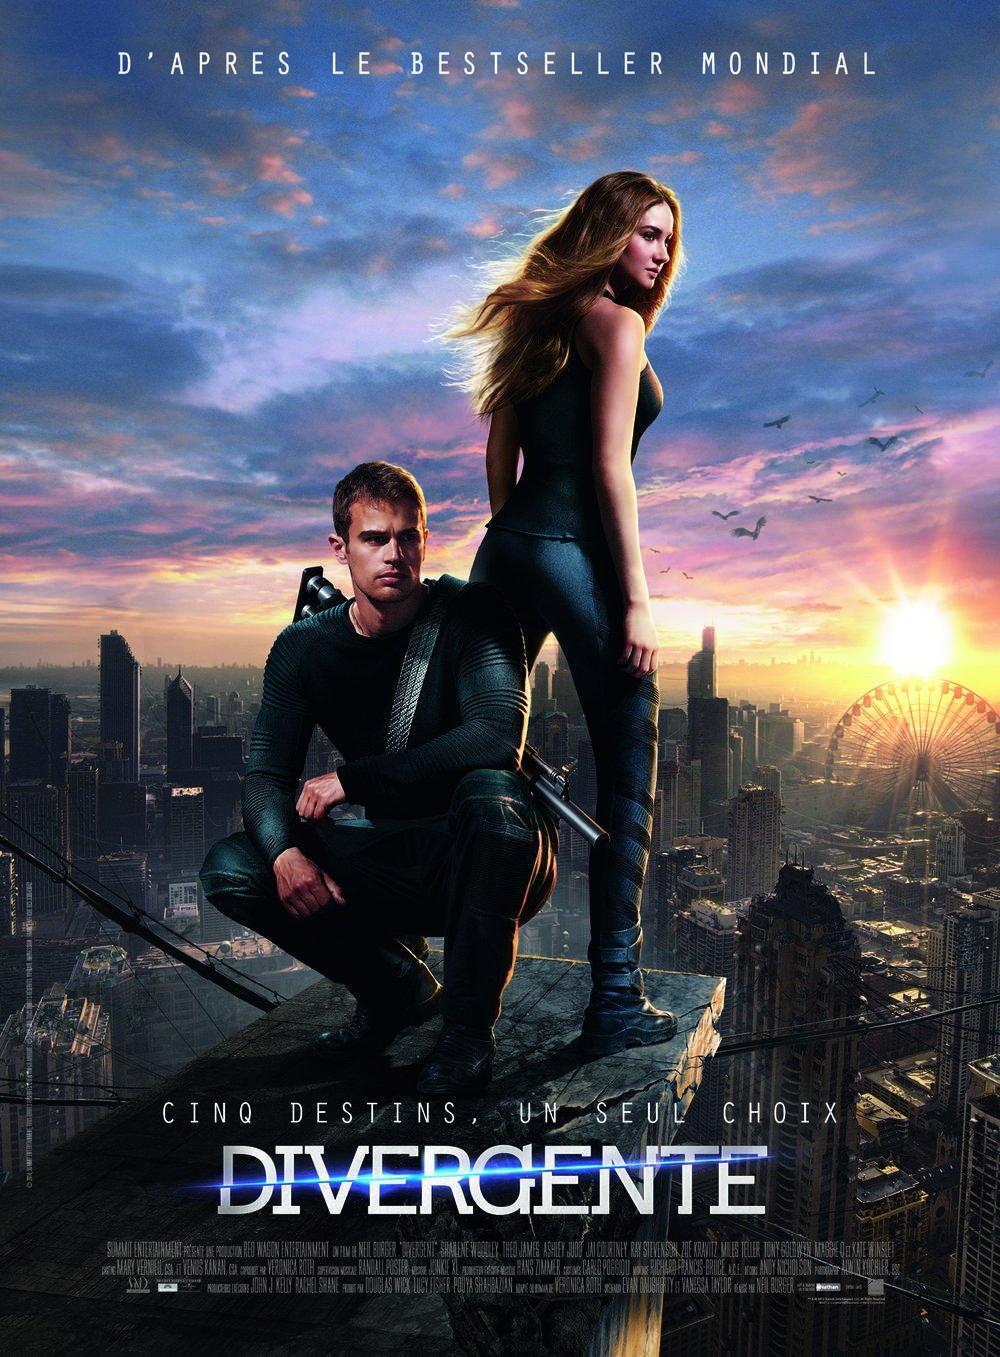 Divergente + Divergente 2 : Linsurrection [Blu-ray]: Amazon.es: Shailene Woodley, Theo James, Naomi Watts, Daniel Dae Kim, Kate Winslet, Ashley Judd, Jai Courtney ...